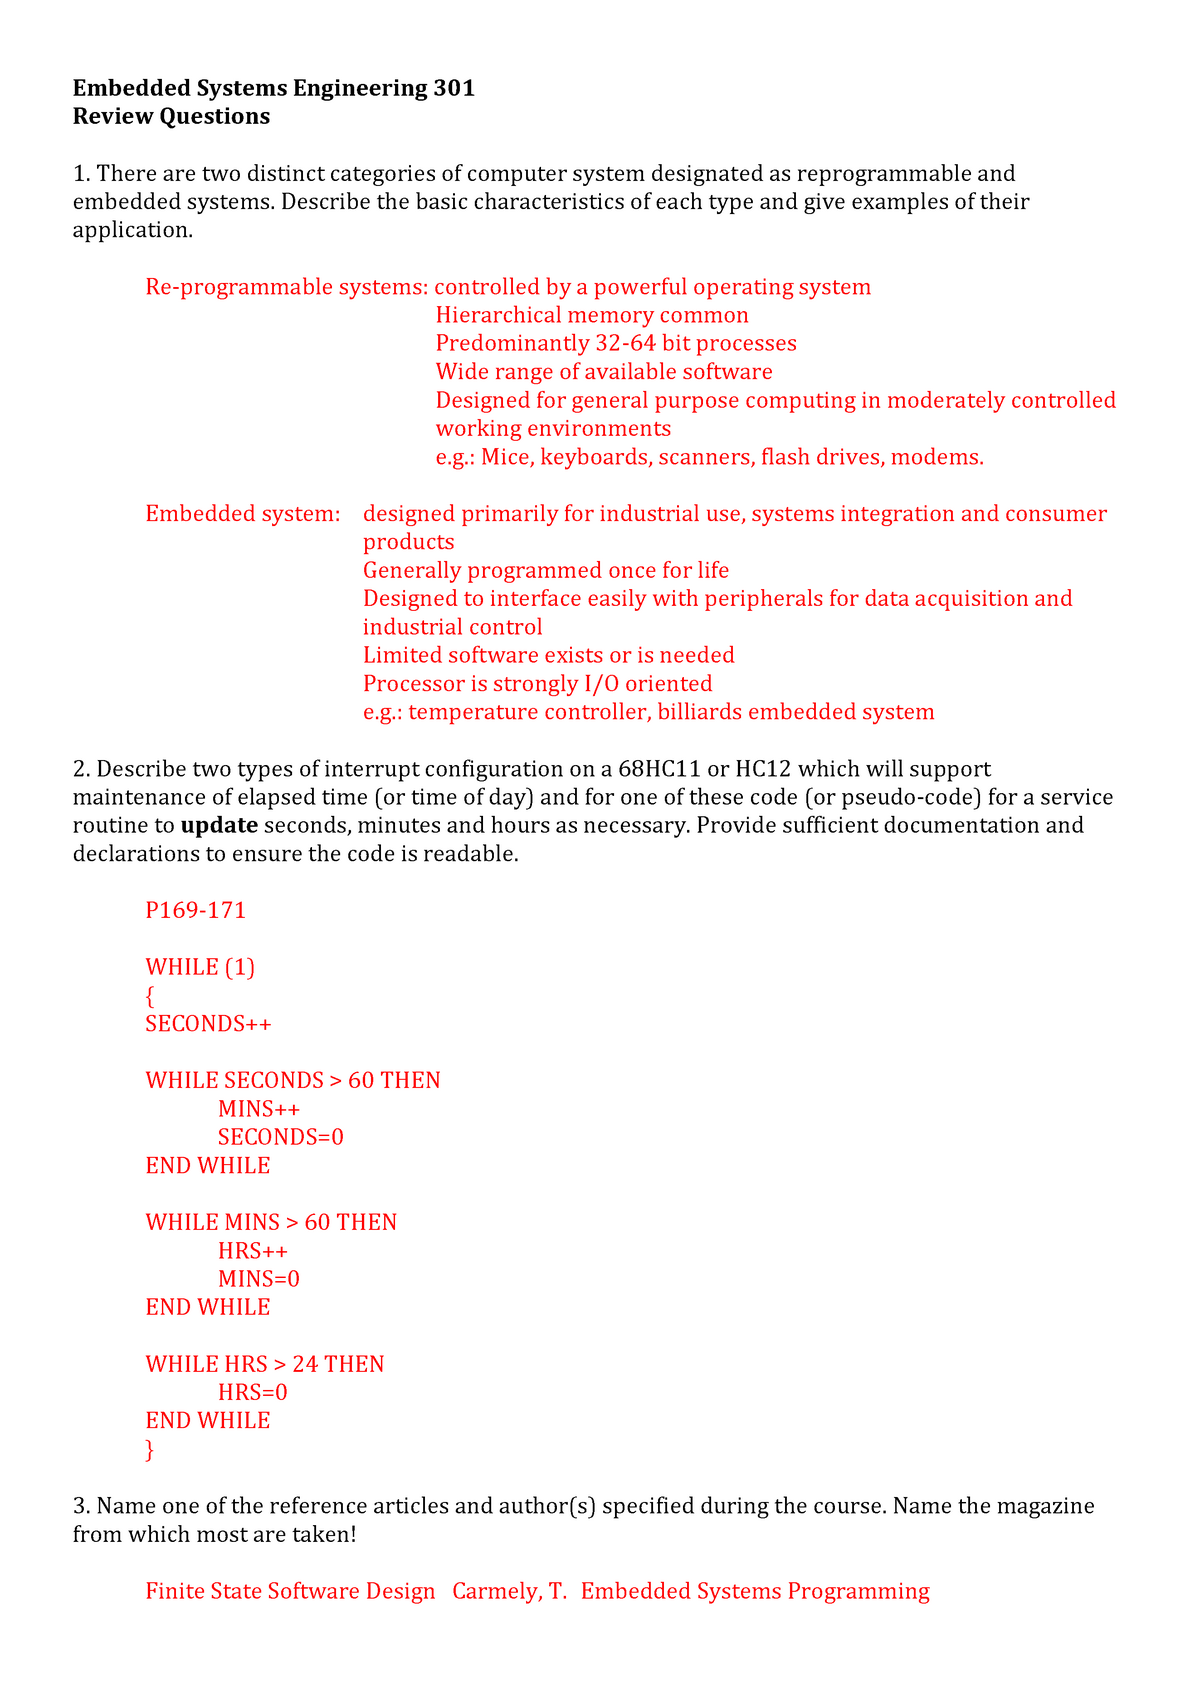 Exam 2009 - 12855: Embedded Systems Engineering 301 - StuDocu